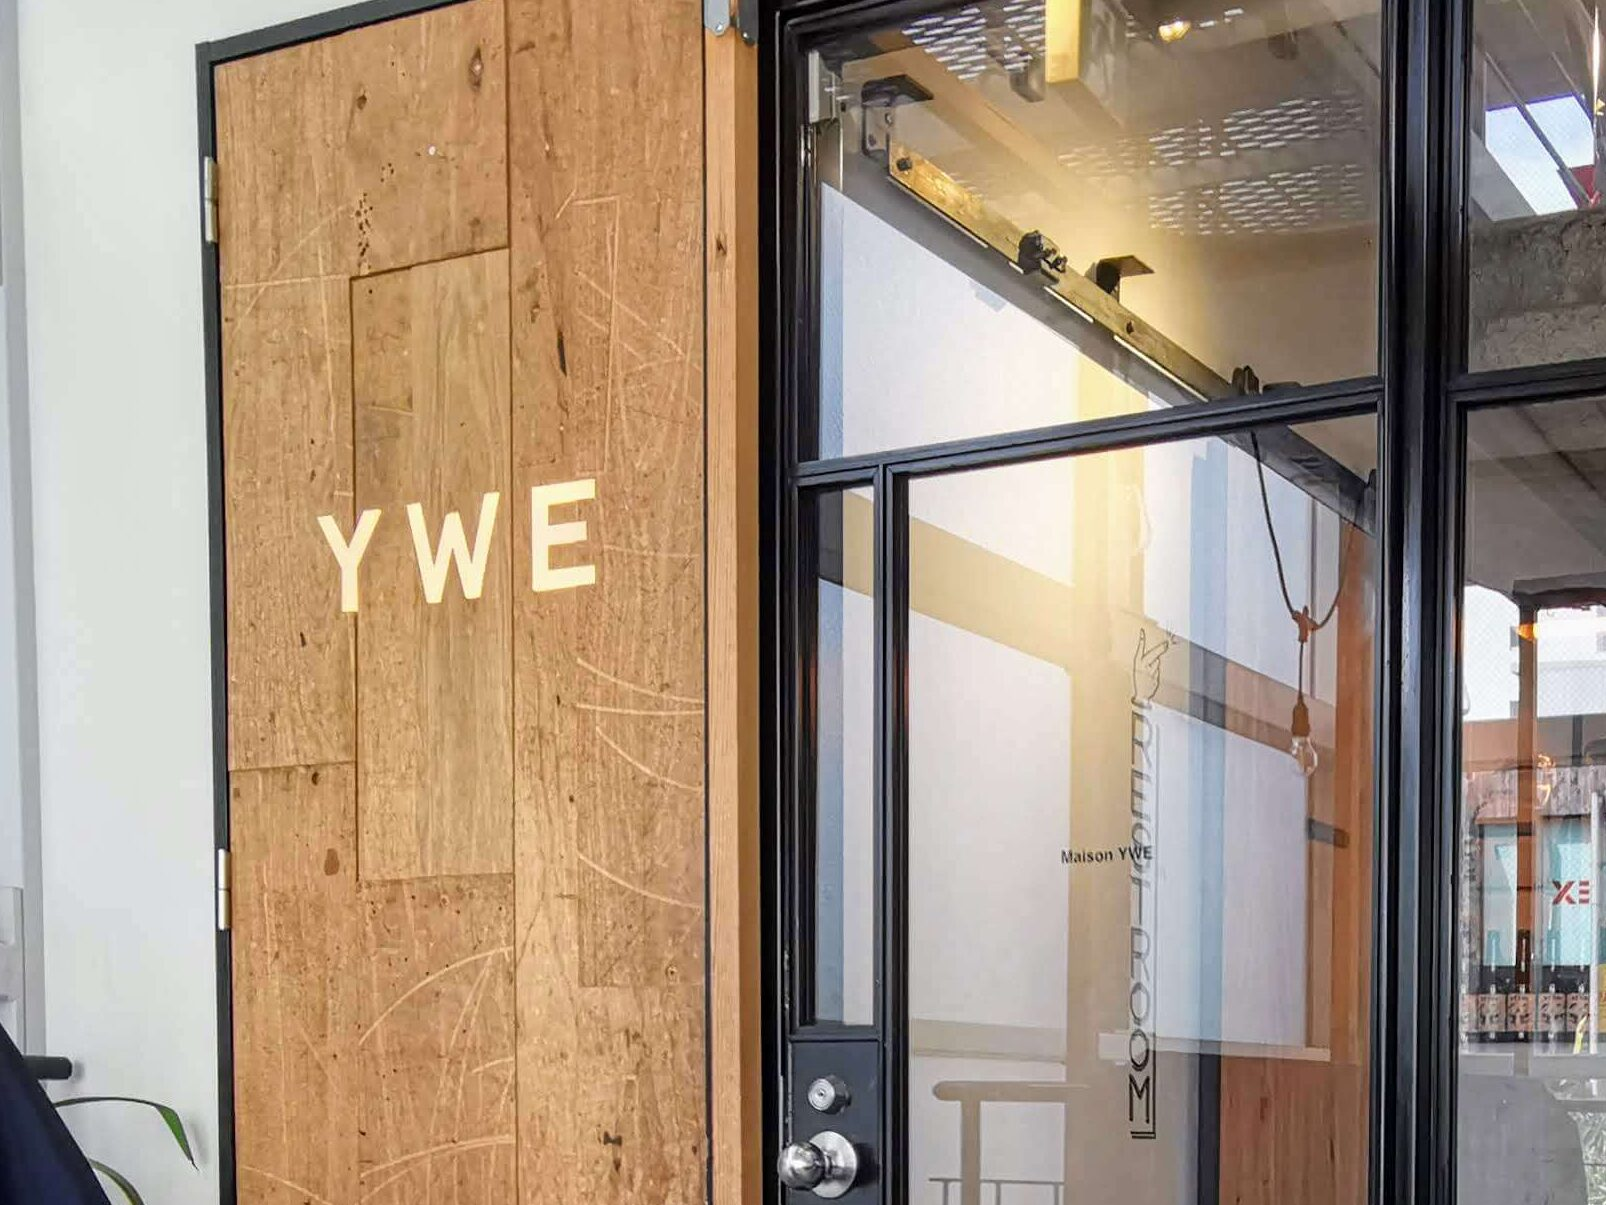 Maison YWE メゾン・イー 名古屋 (7)